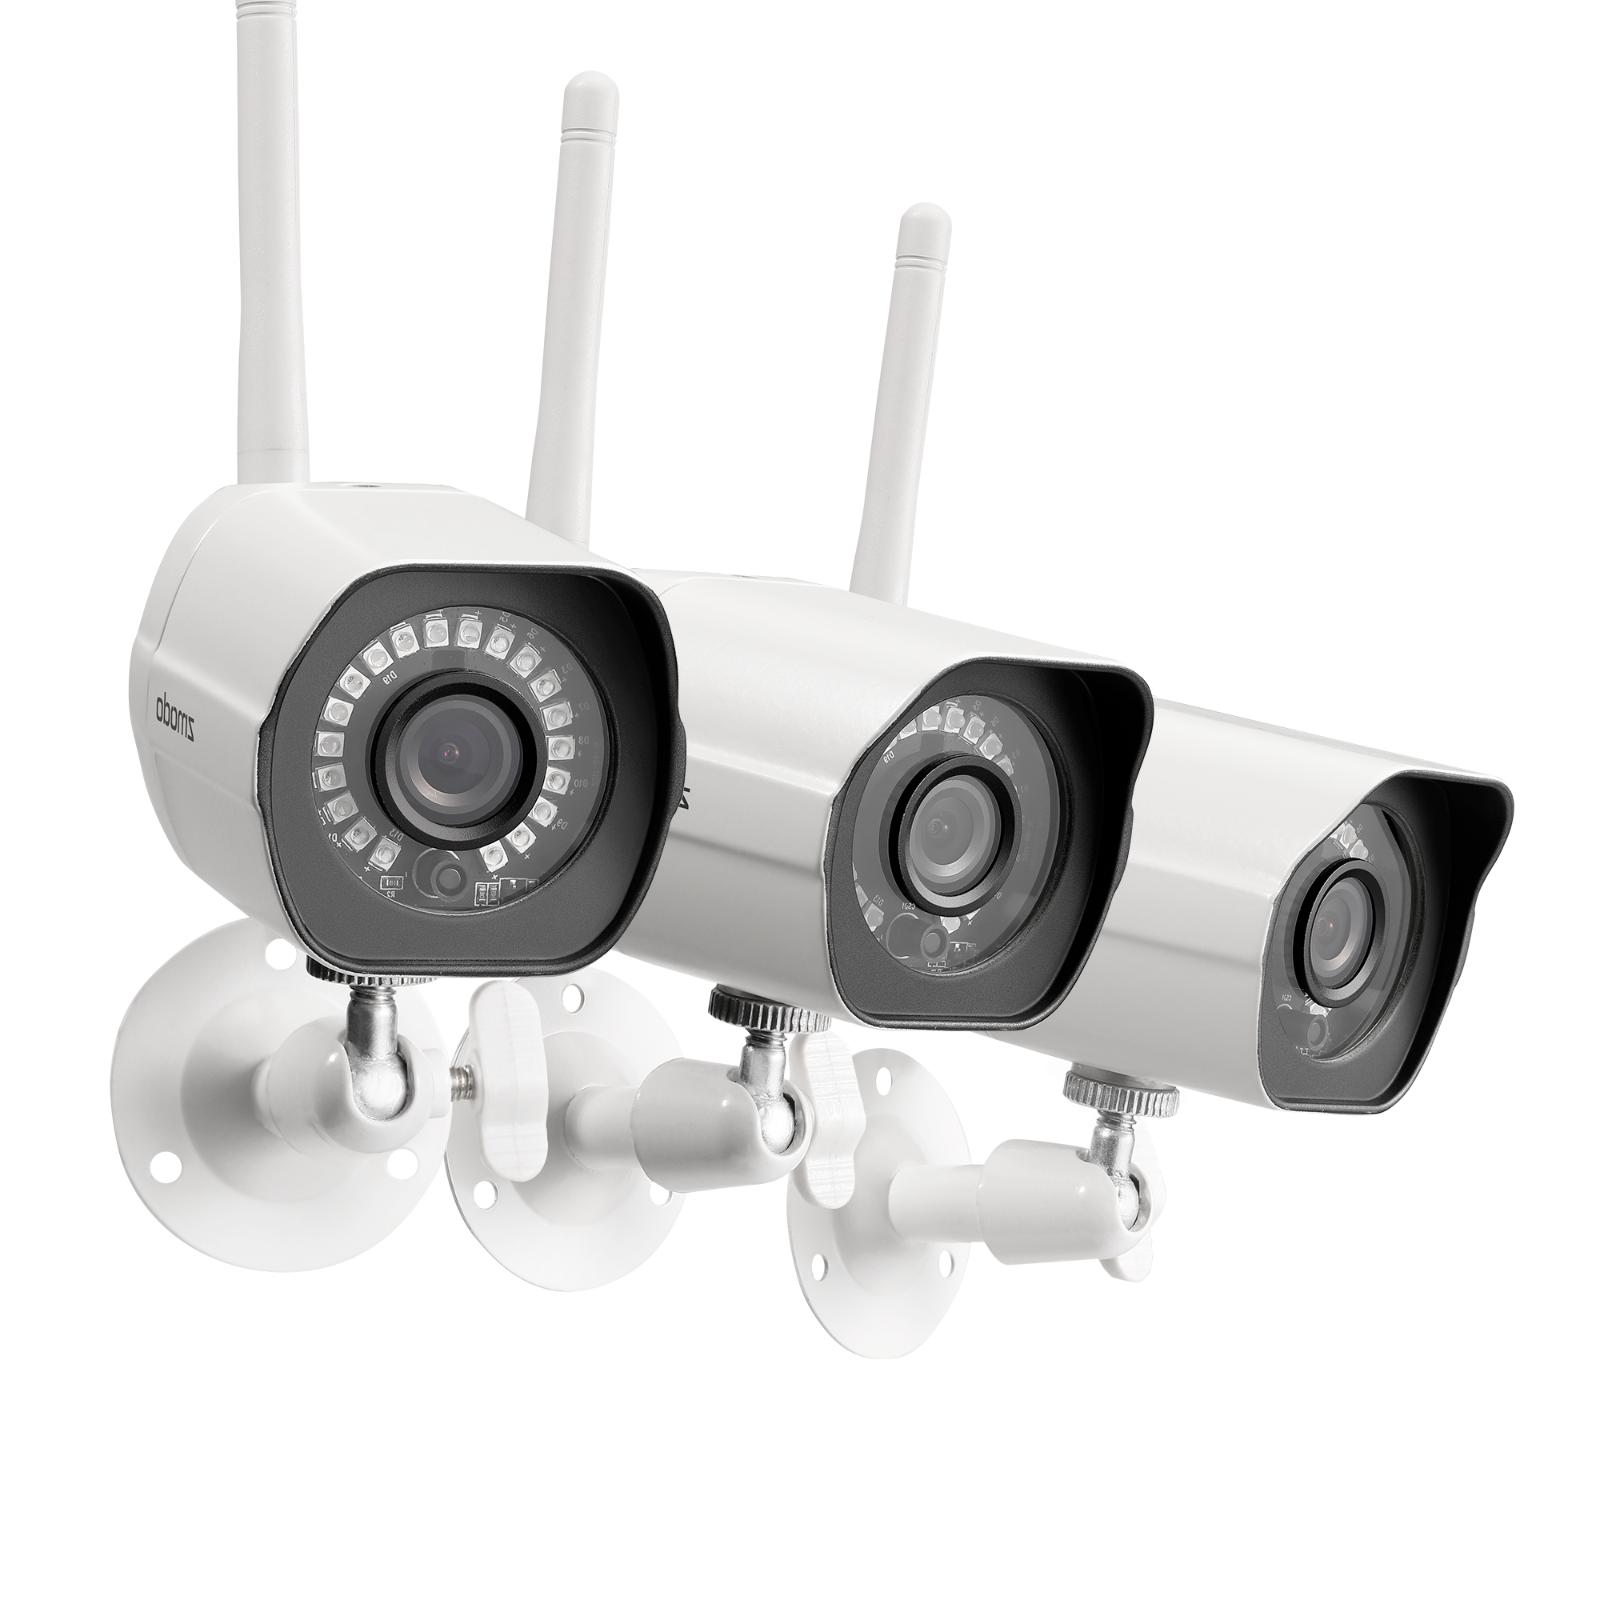 Zmodo 1080p CCTV Wireless Security Bullet IP Camera SystemOu